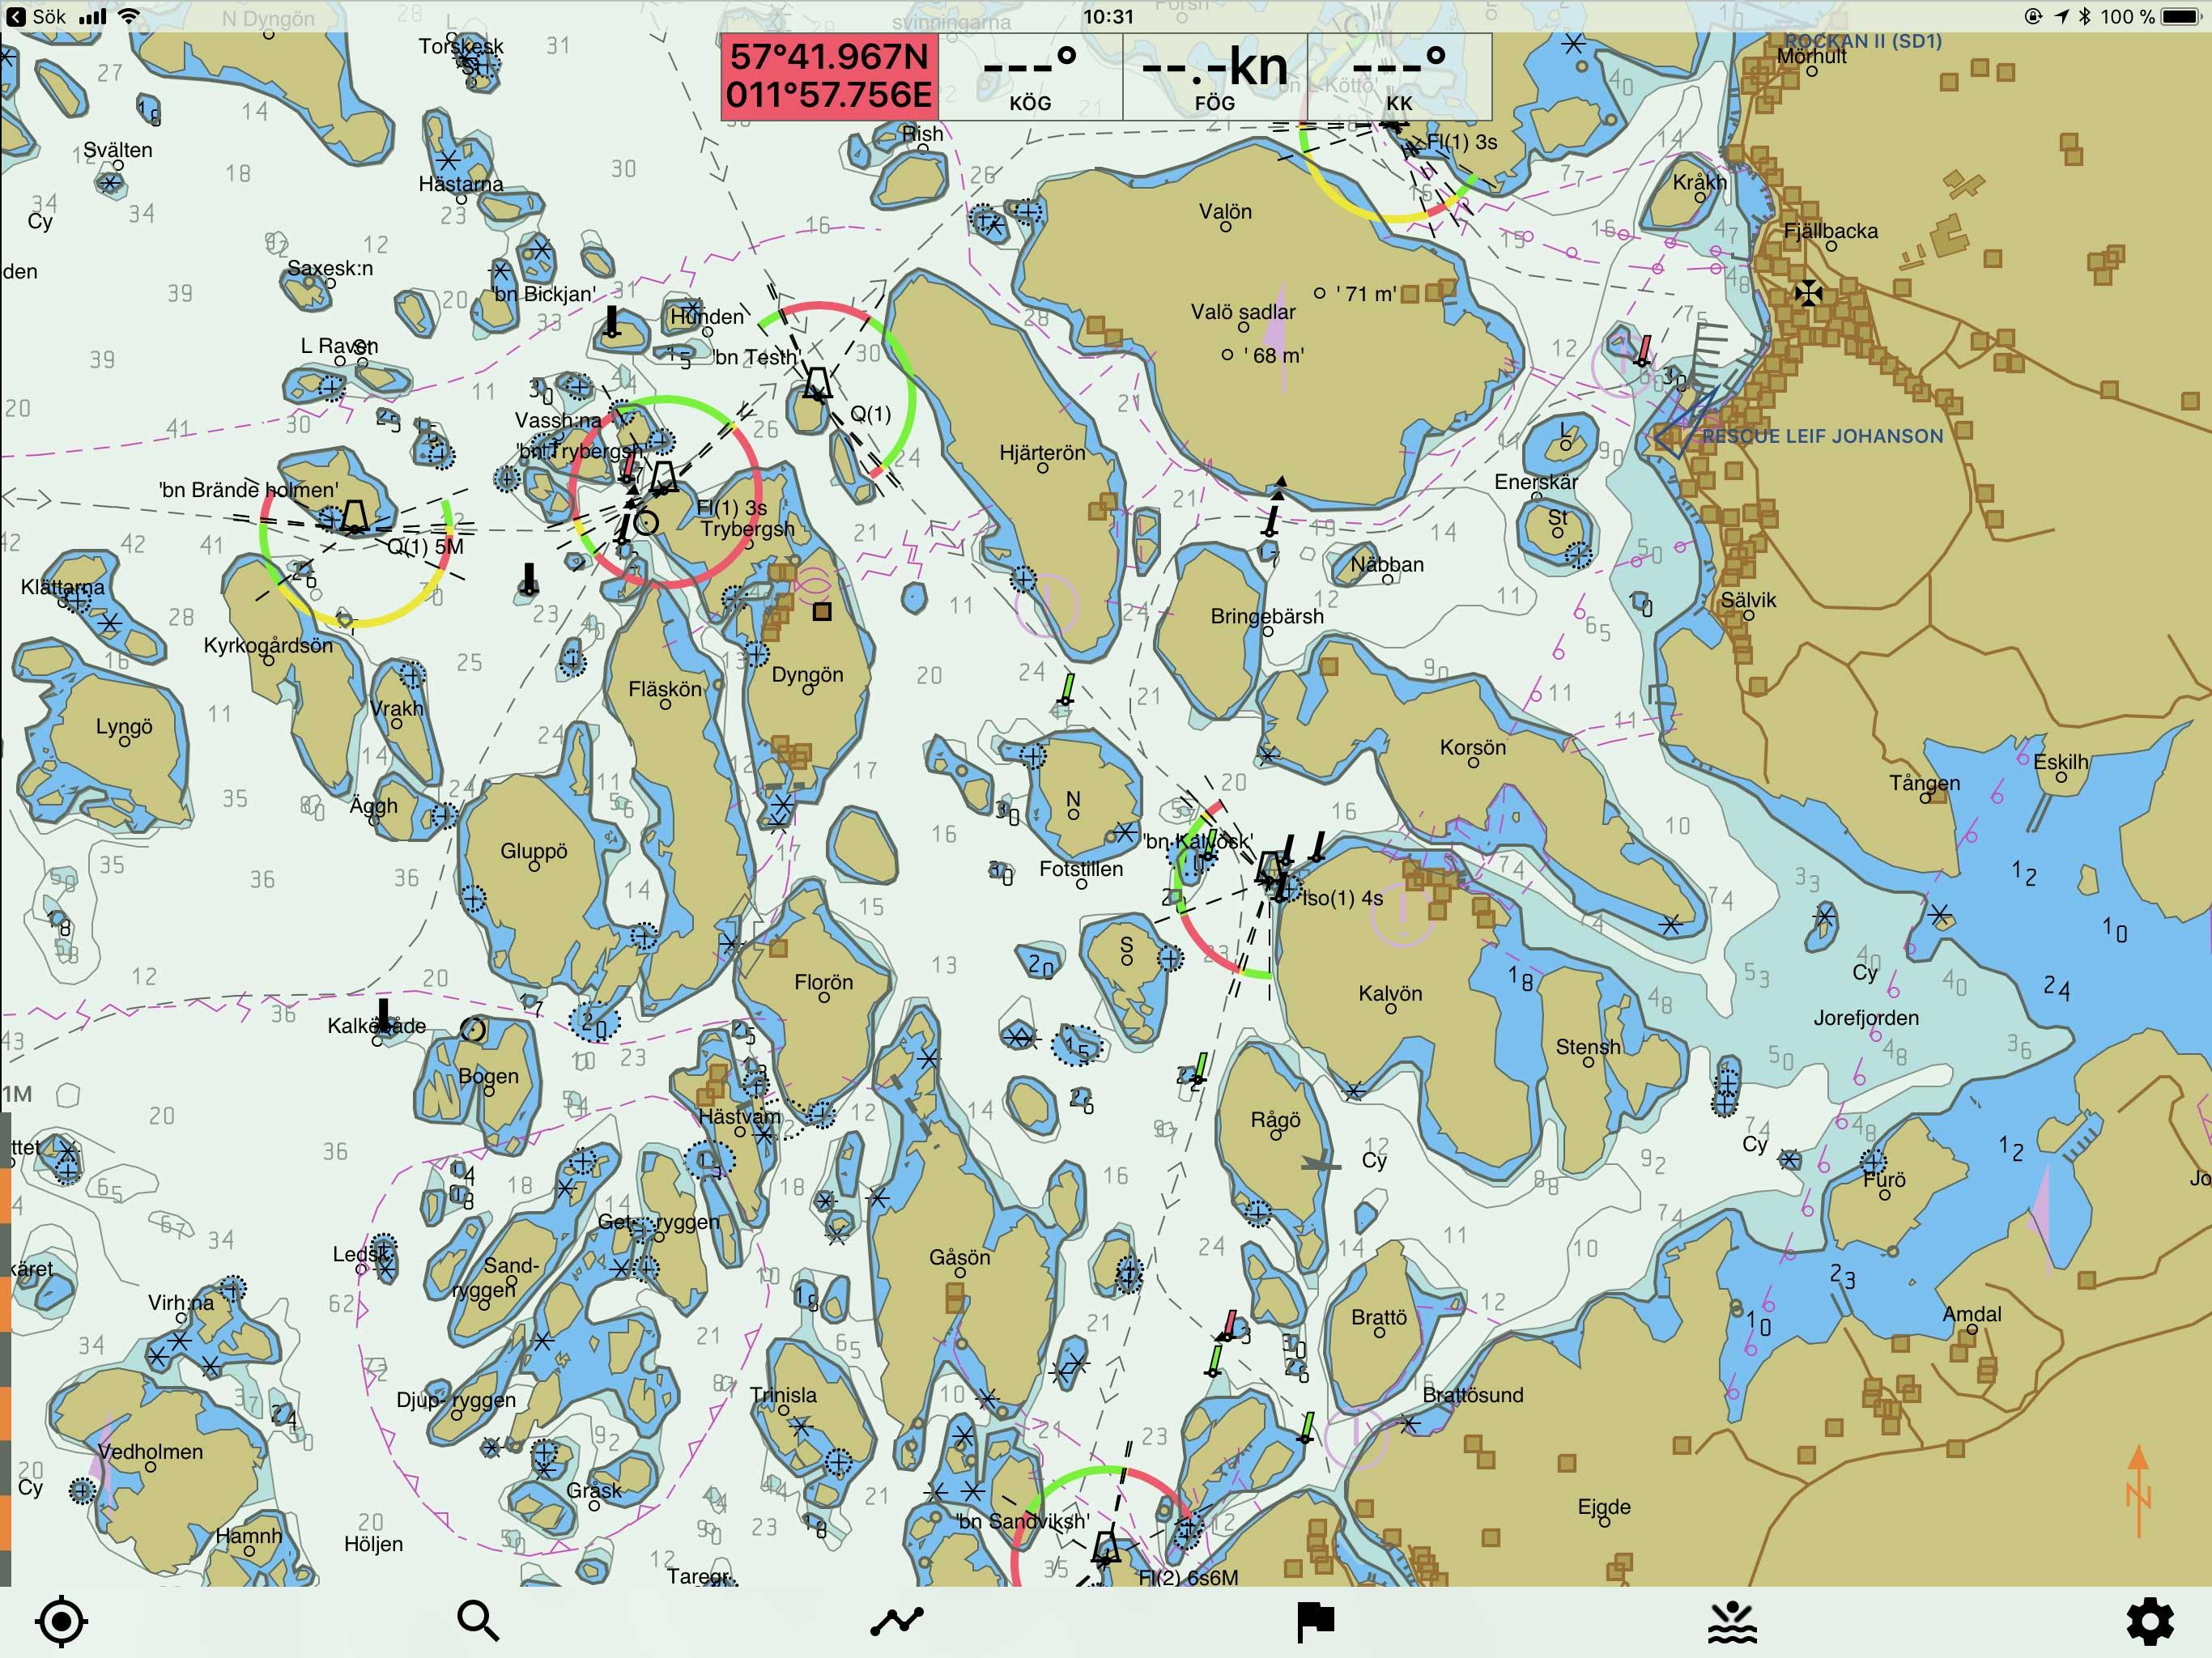 archipelago_seapilot.jpg